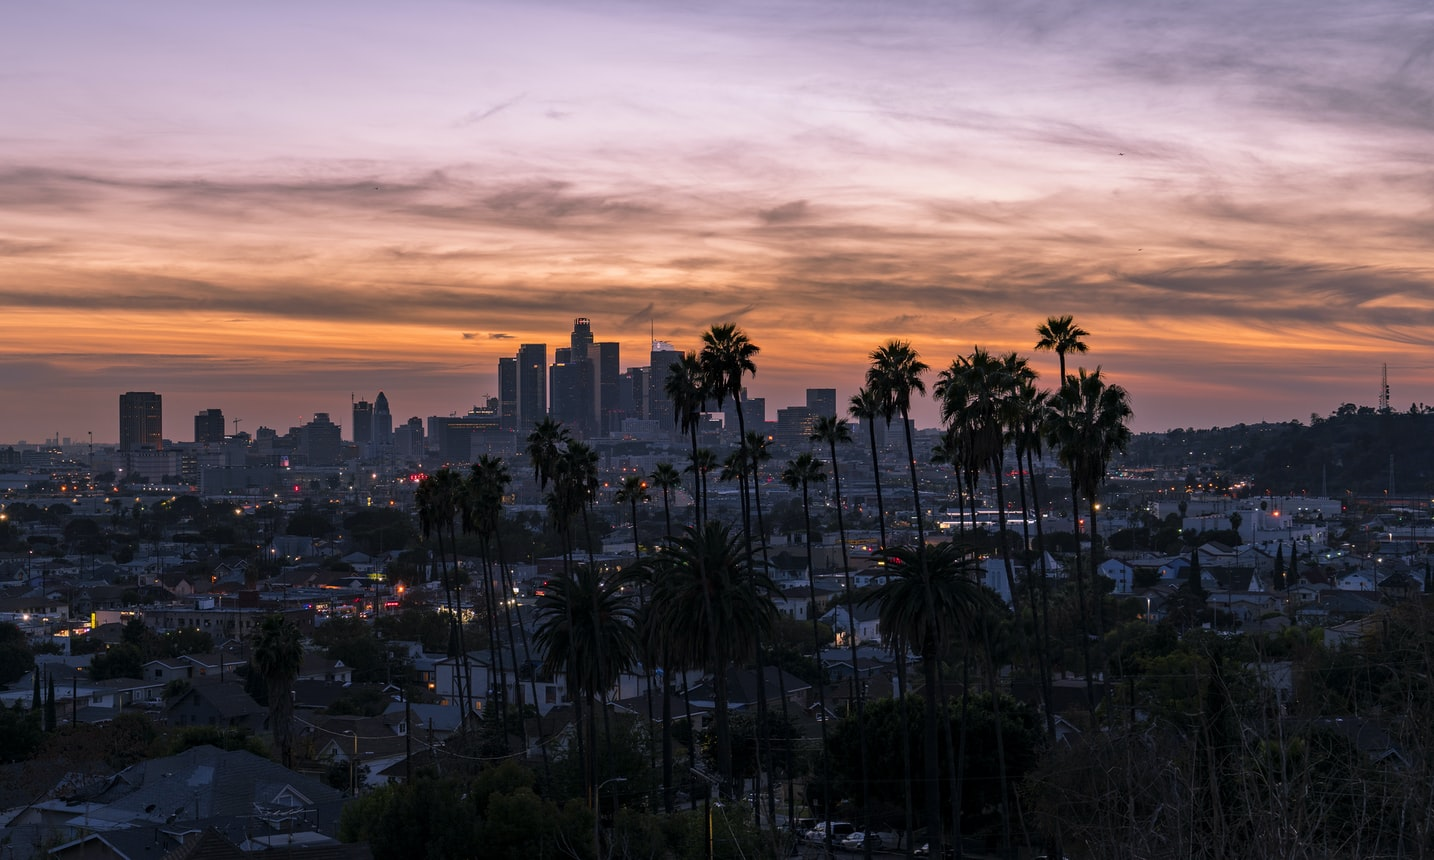 Pôr do sol em Los Angeles